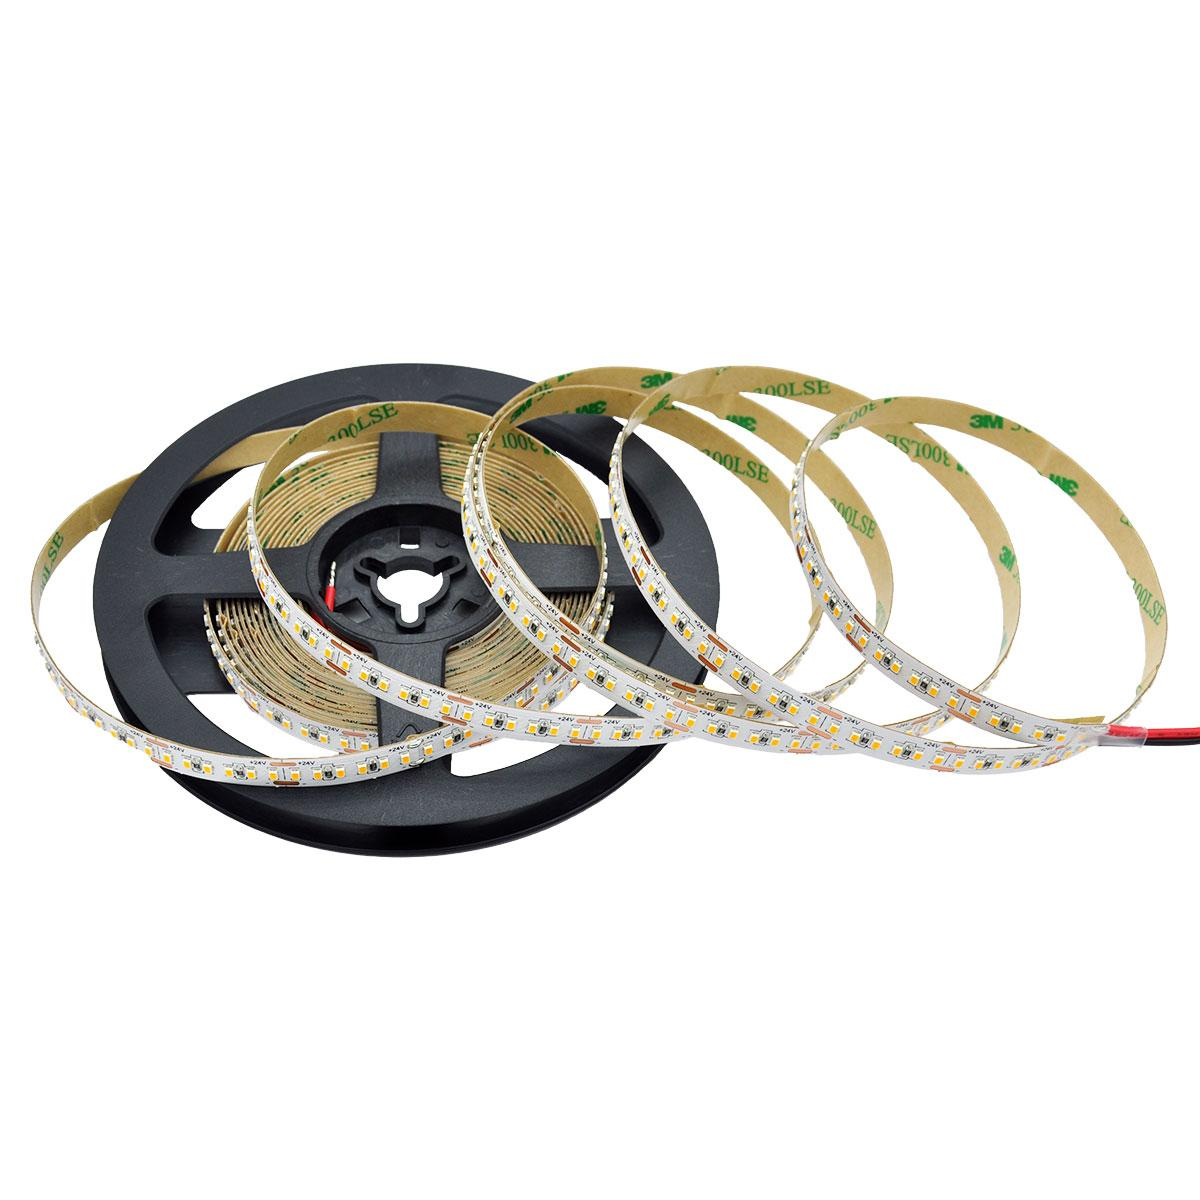 Strip Warmweiß 24V CRI90 LED Streifen 5M 12W/m 240LED/m 8mm IP20 3000K